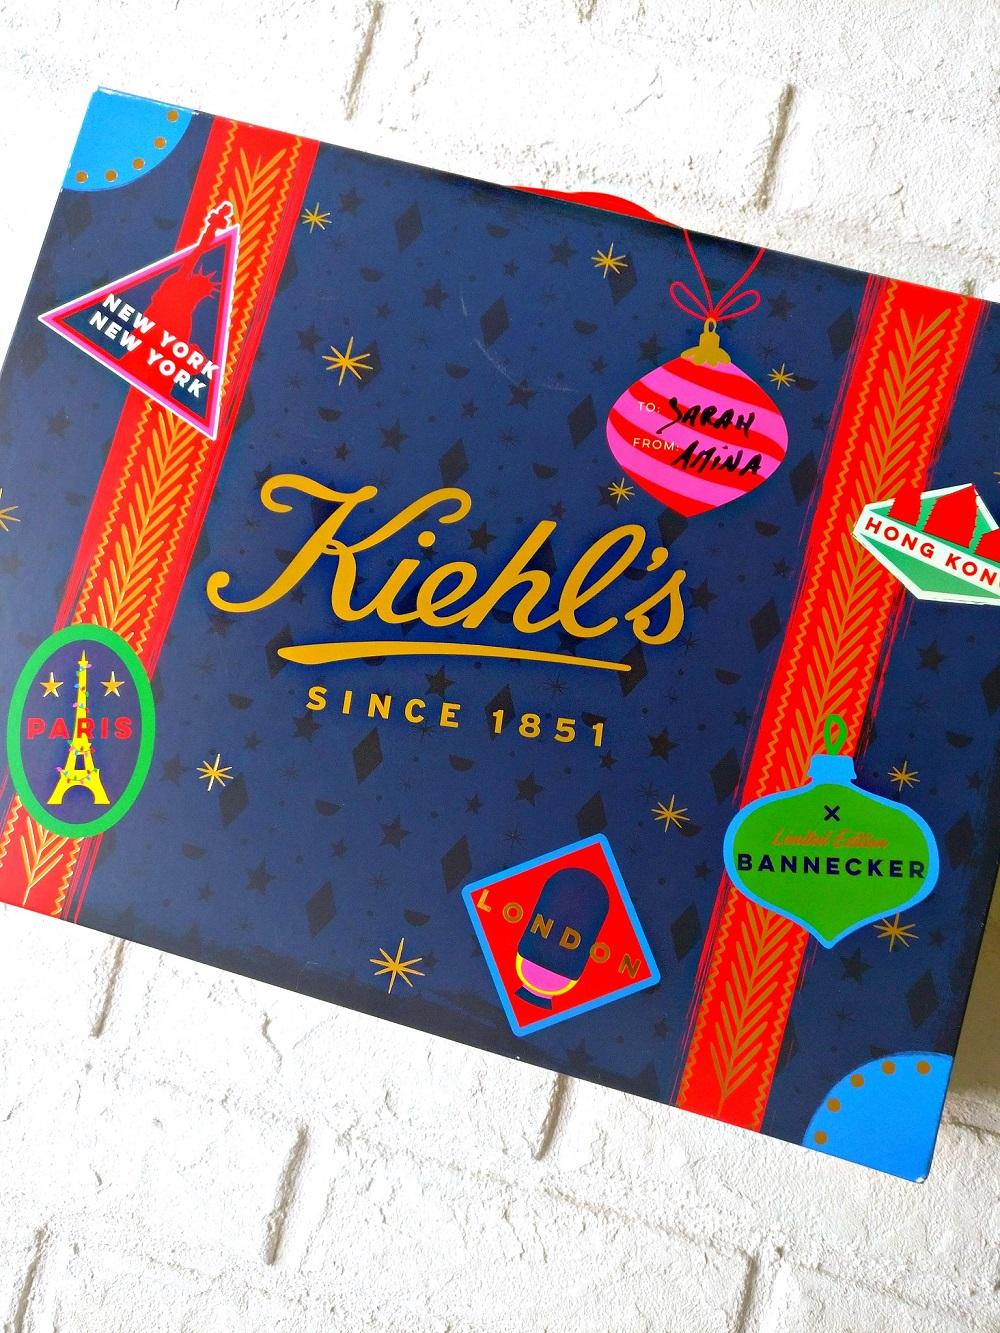 Kiehl's 2018 Limited Edition Adventskalender